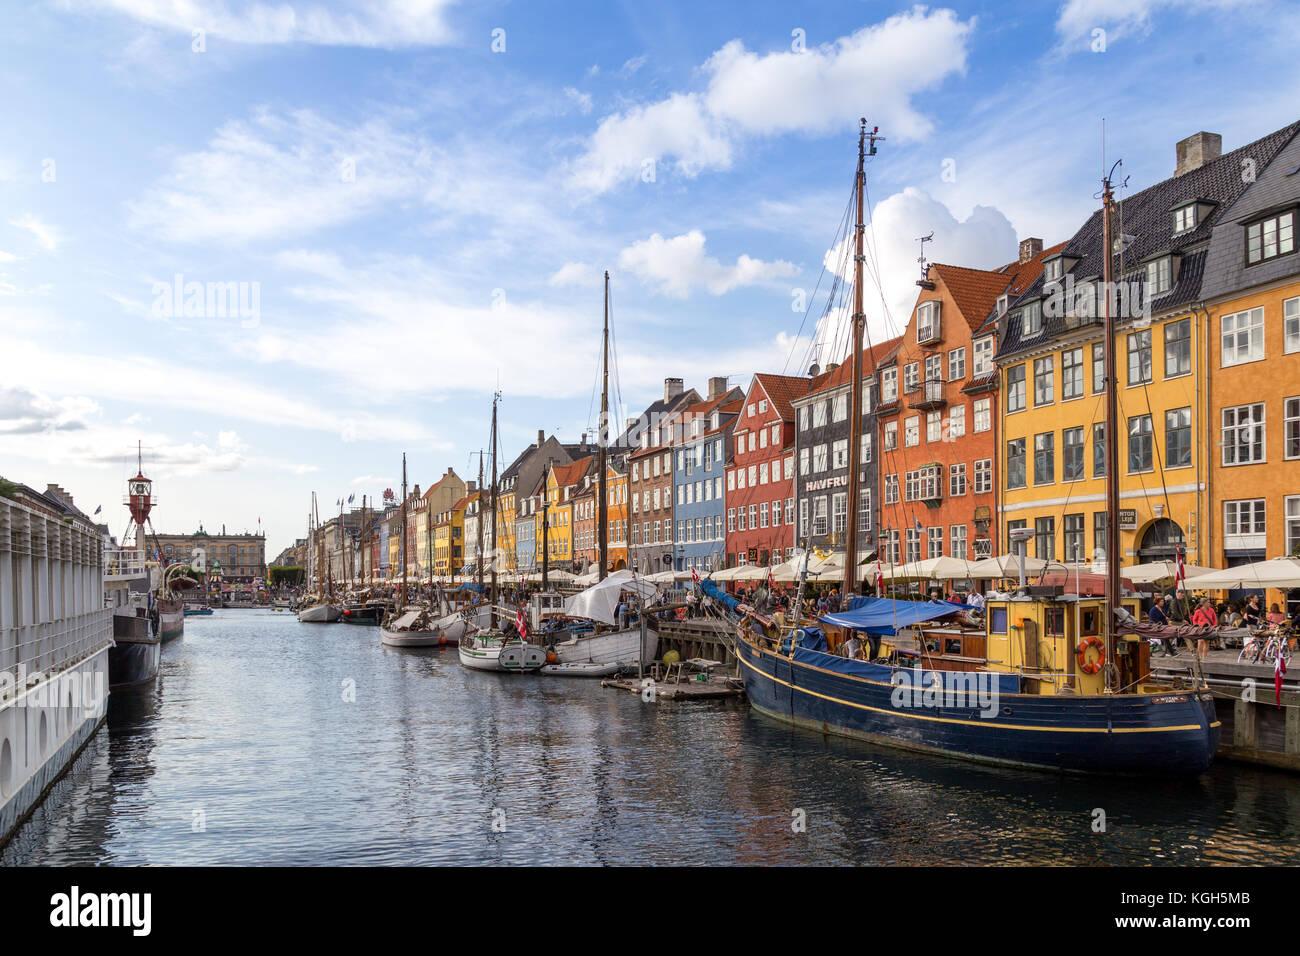 Nyhavn harbor in Copenhagen, Denmark - Stock Image